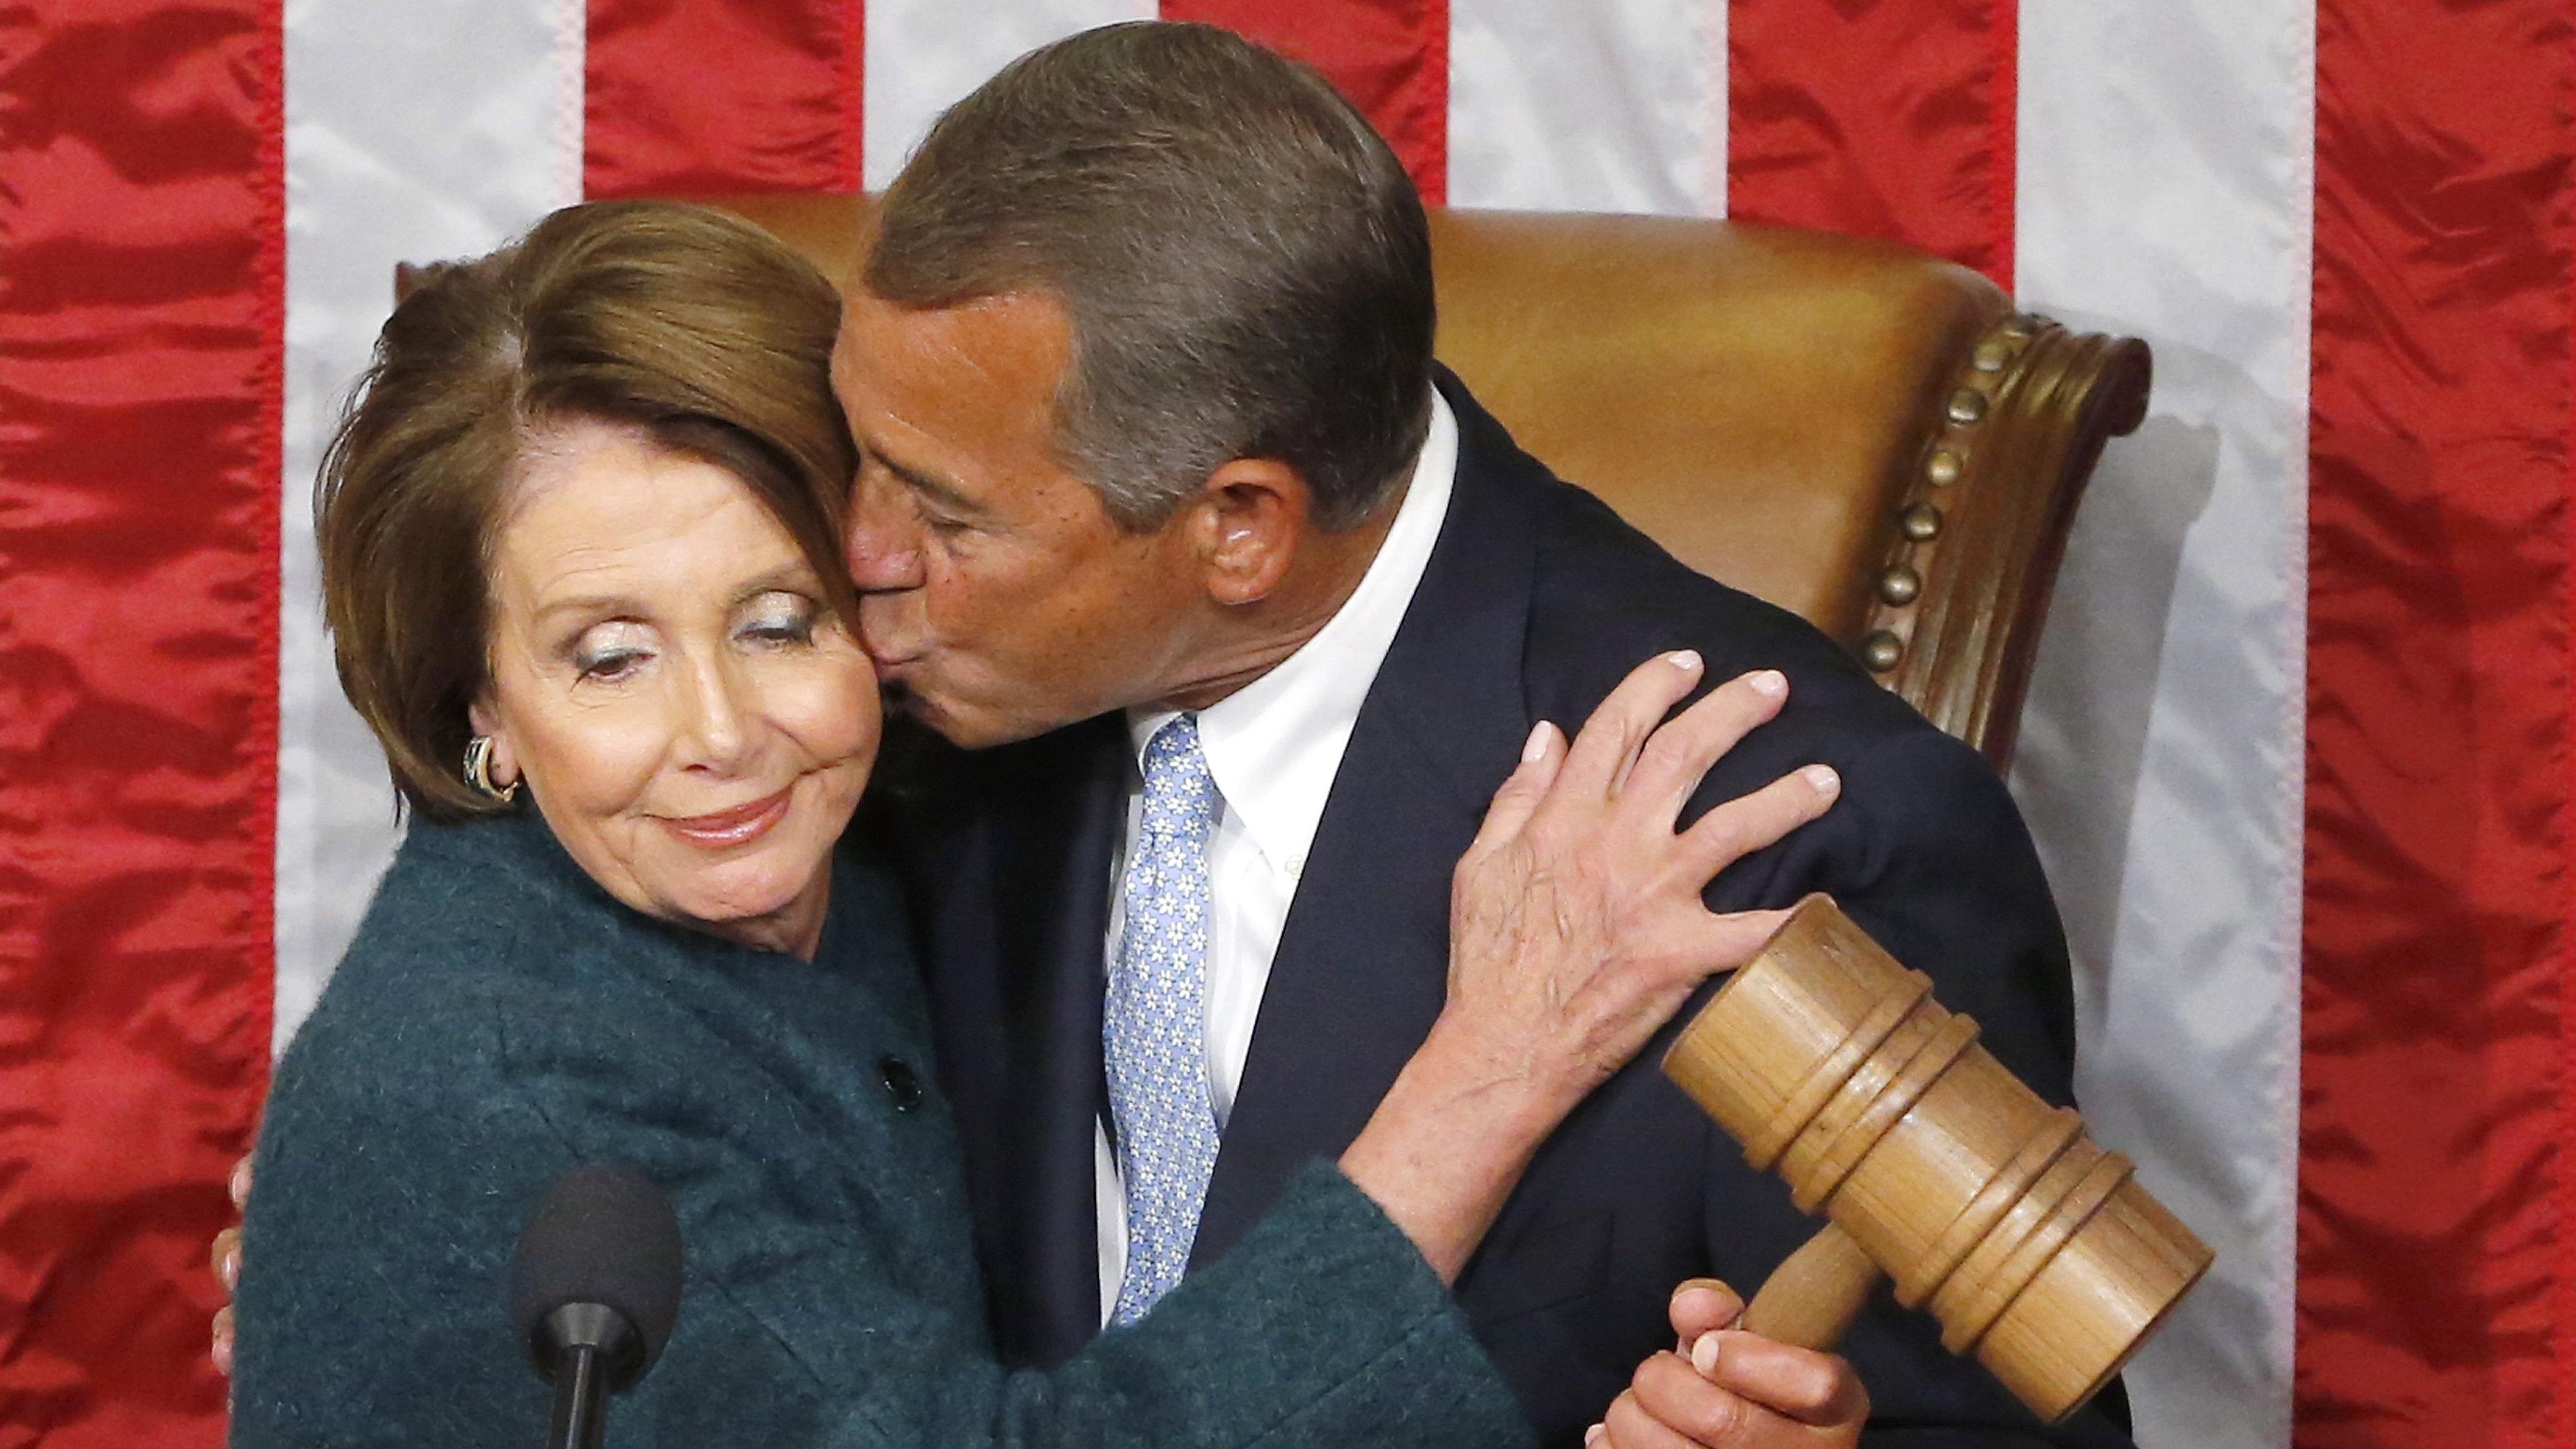 boehner pelosi kiss